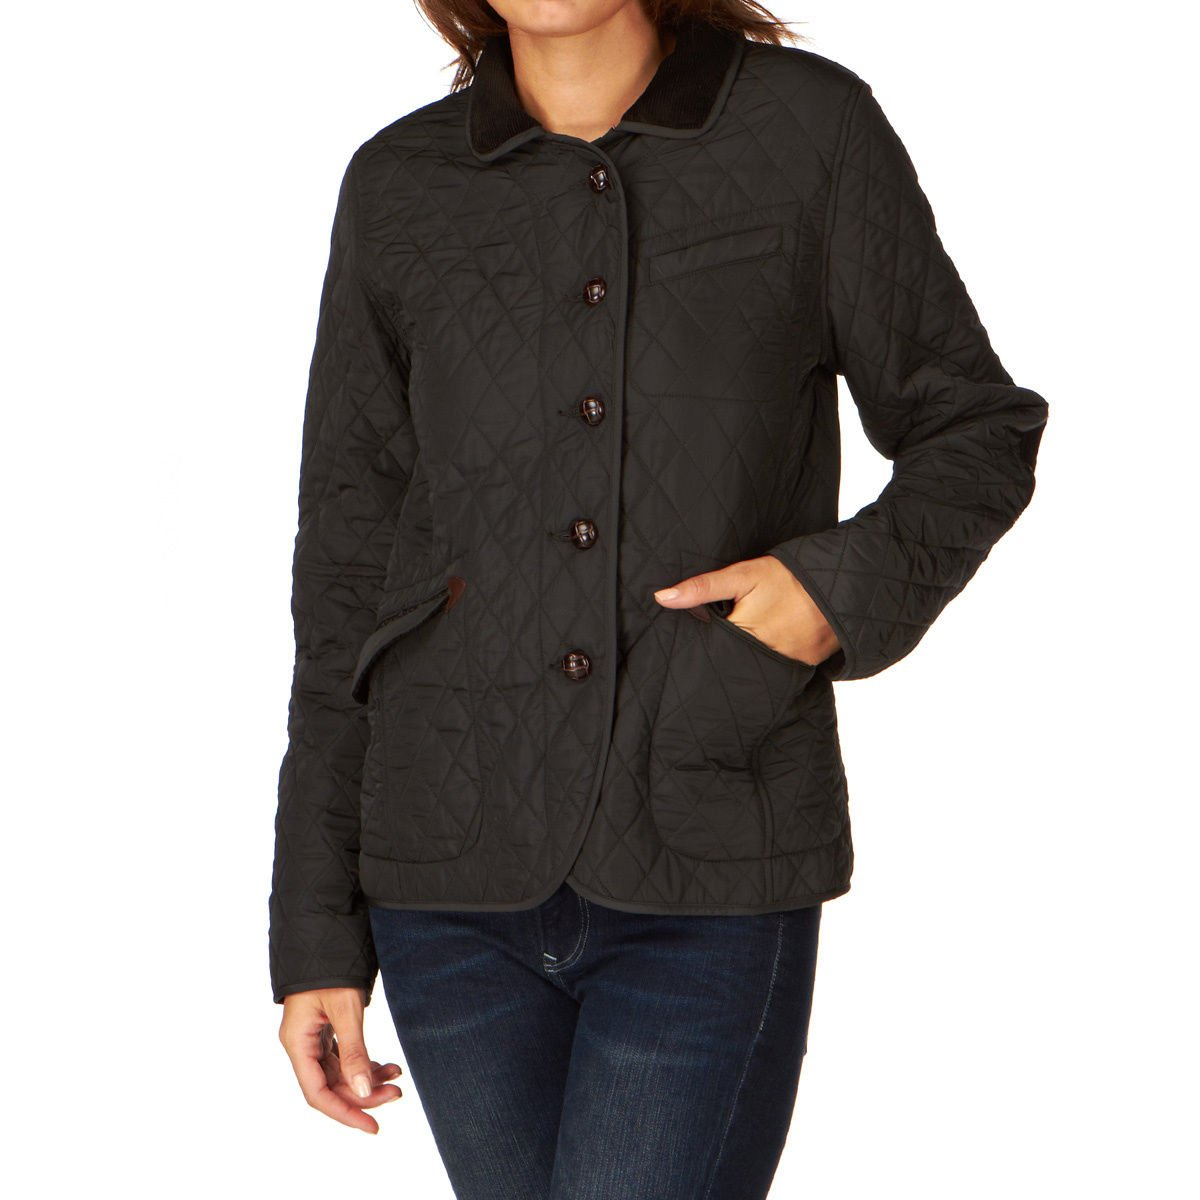 Aigle Sudhampton Damen Jacke Steppjacke, schwarz, Gr. D42 (Frz.44) günstig online kaufen